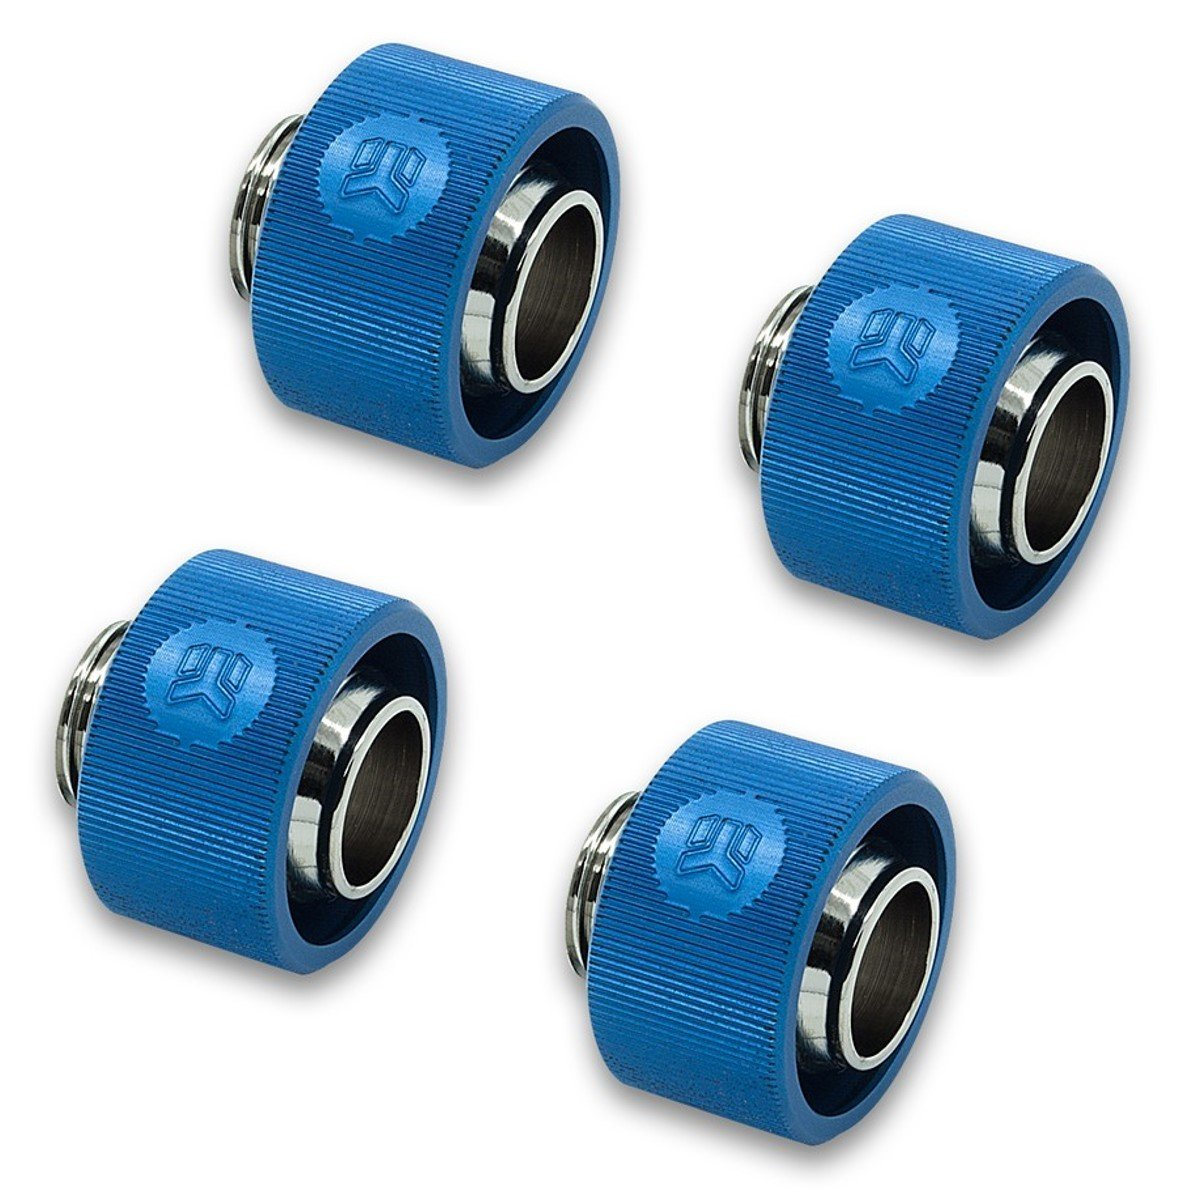 "EKWB EK-ACF Compression Fitting for Soft Tubing, 13/19mm (1/2"" ID, 3/4"" OD), Blue, 4-Pack"